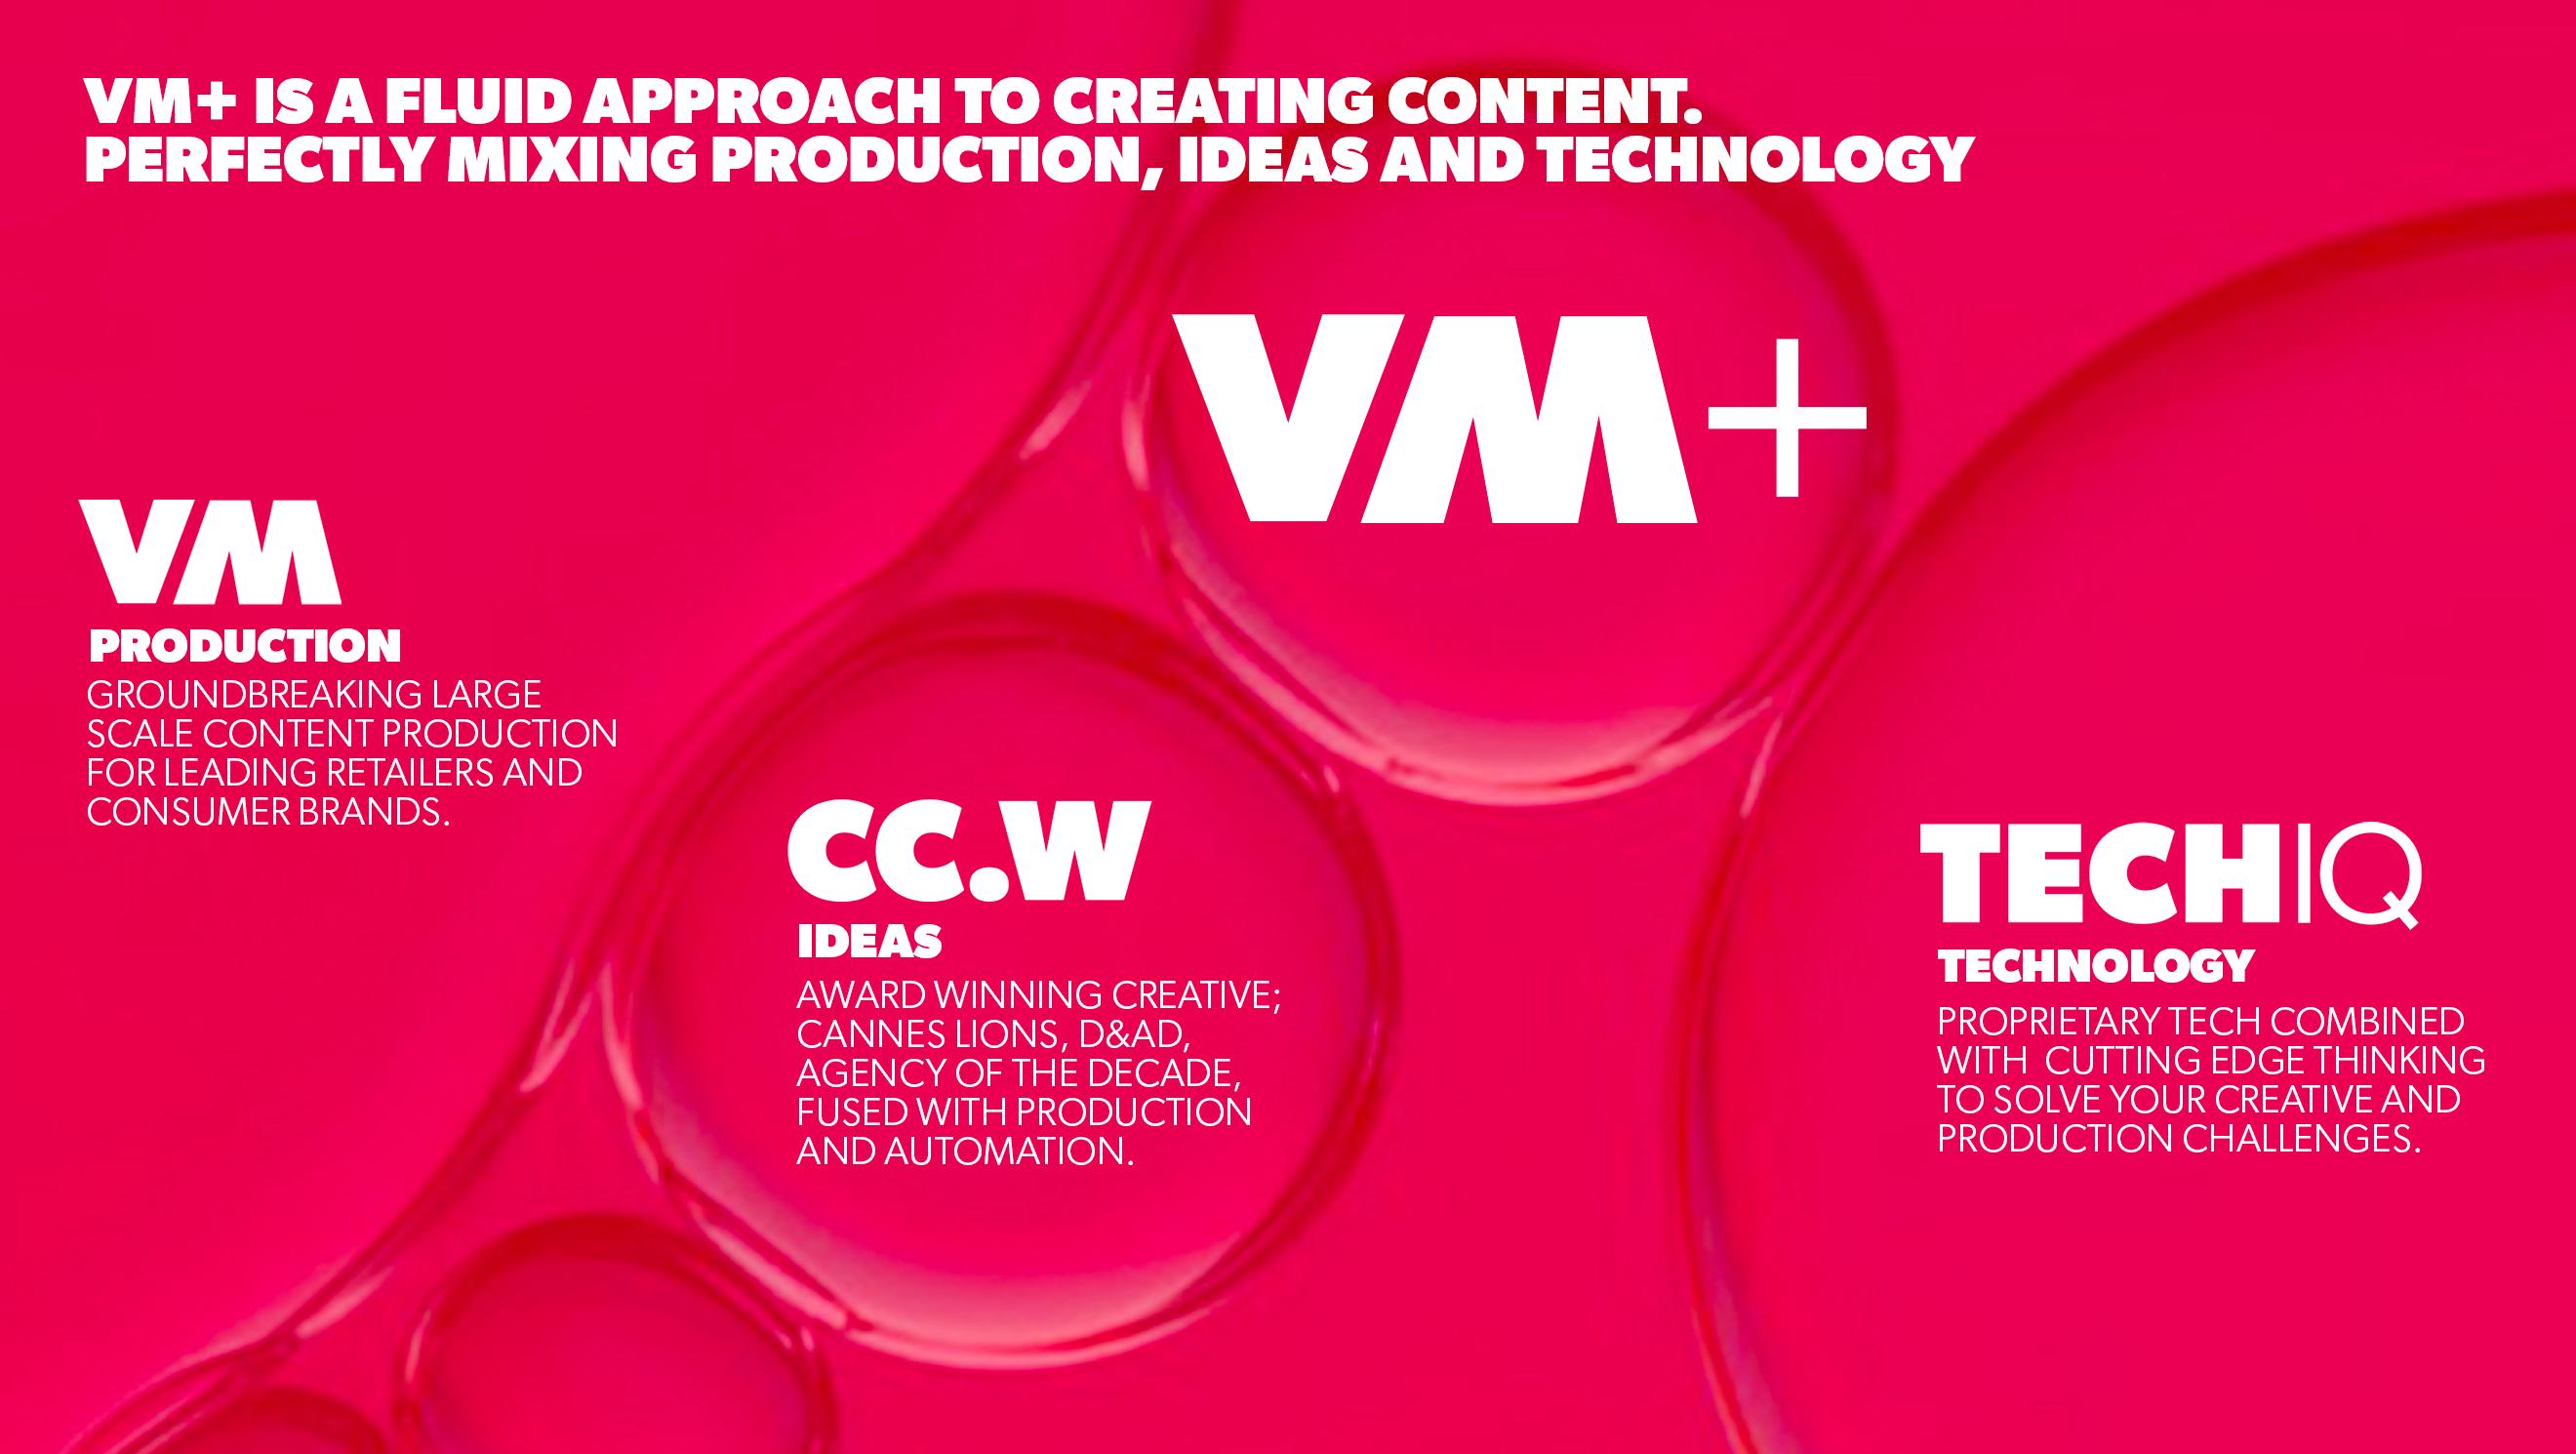 VM+ Fluid Content Creation